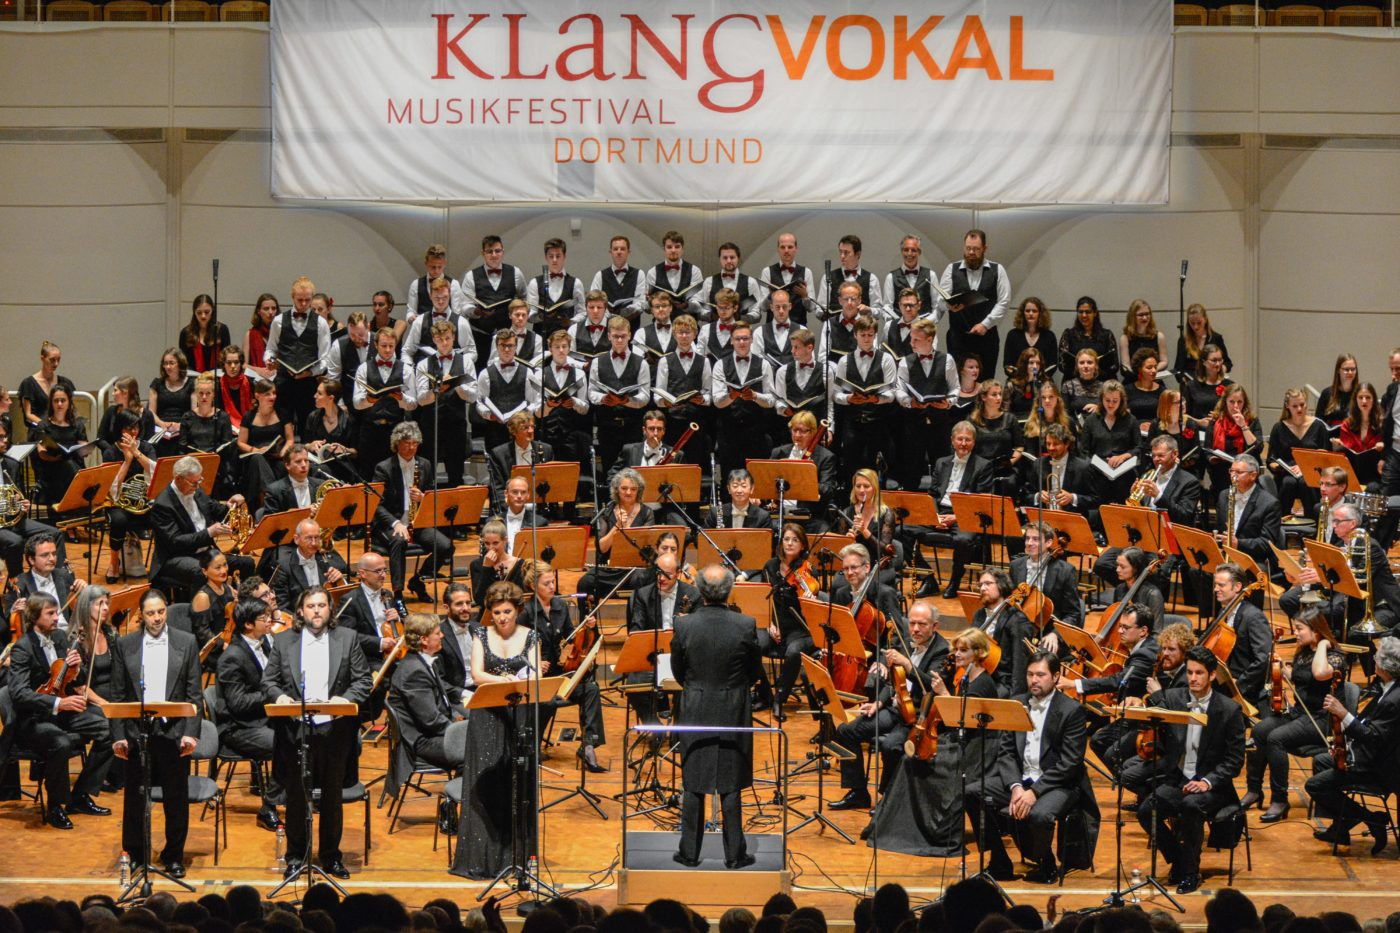 Klangvokal Musikfestival Dortmund/Giovanna D'Arco/Foto ©Bülent Kirschbaum